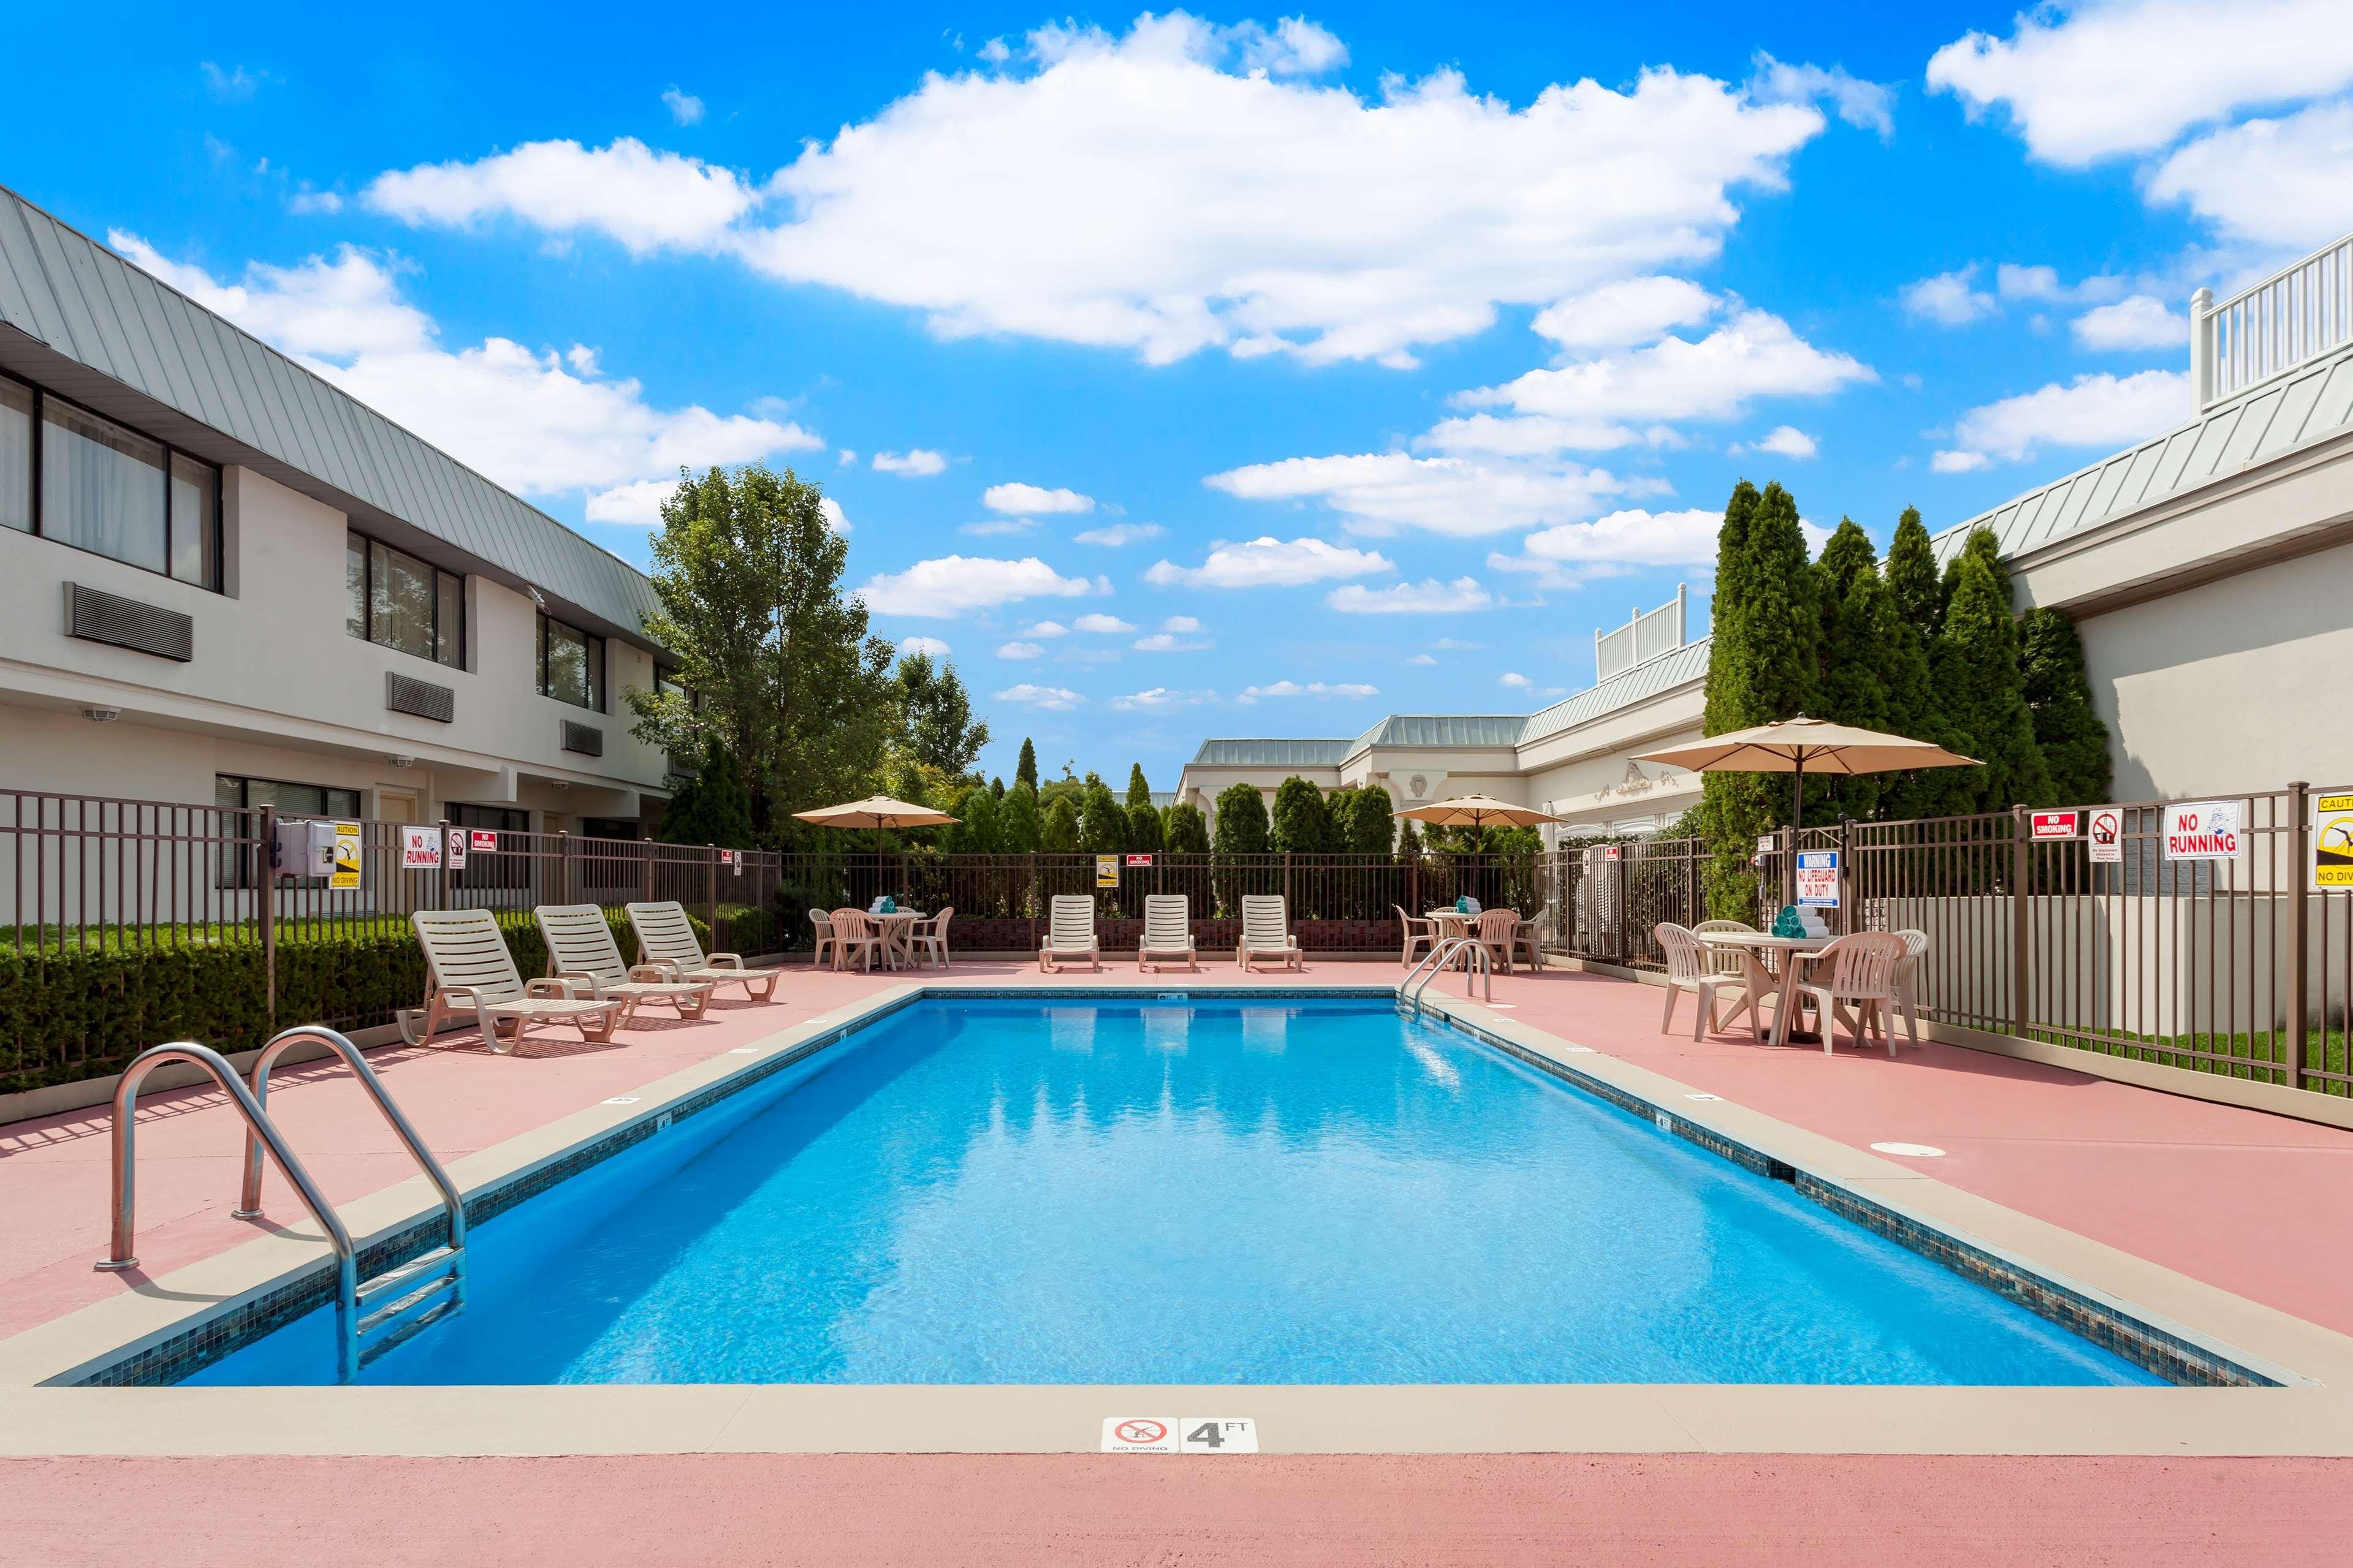 Best Western Leisure Inn image 2